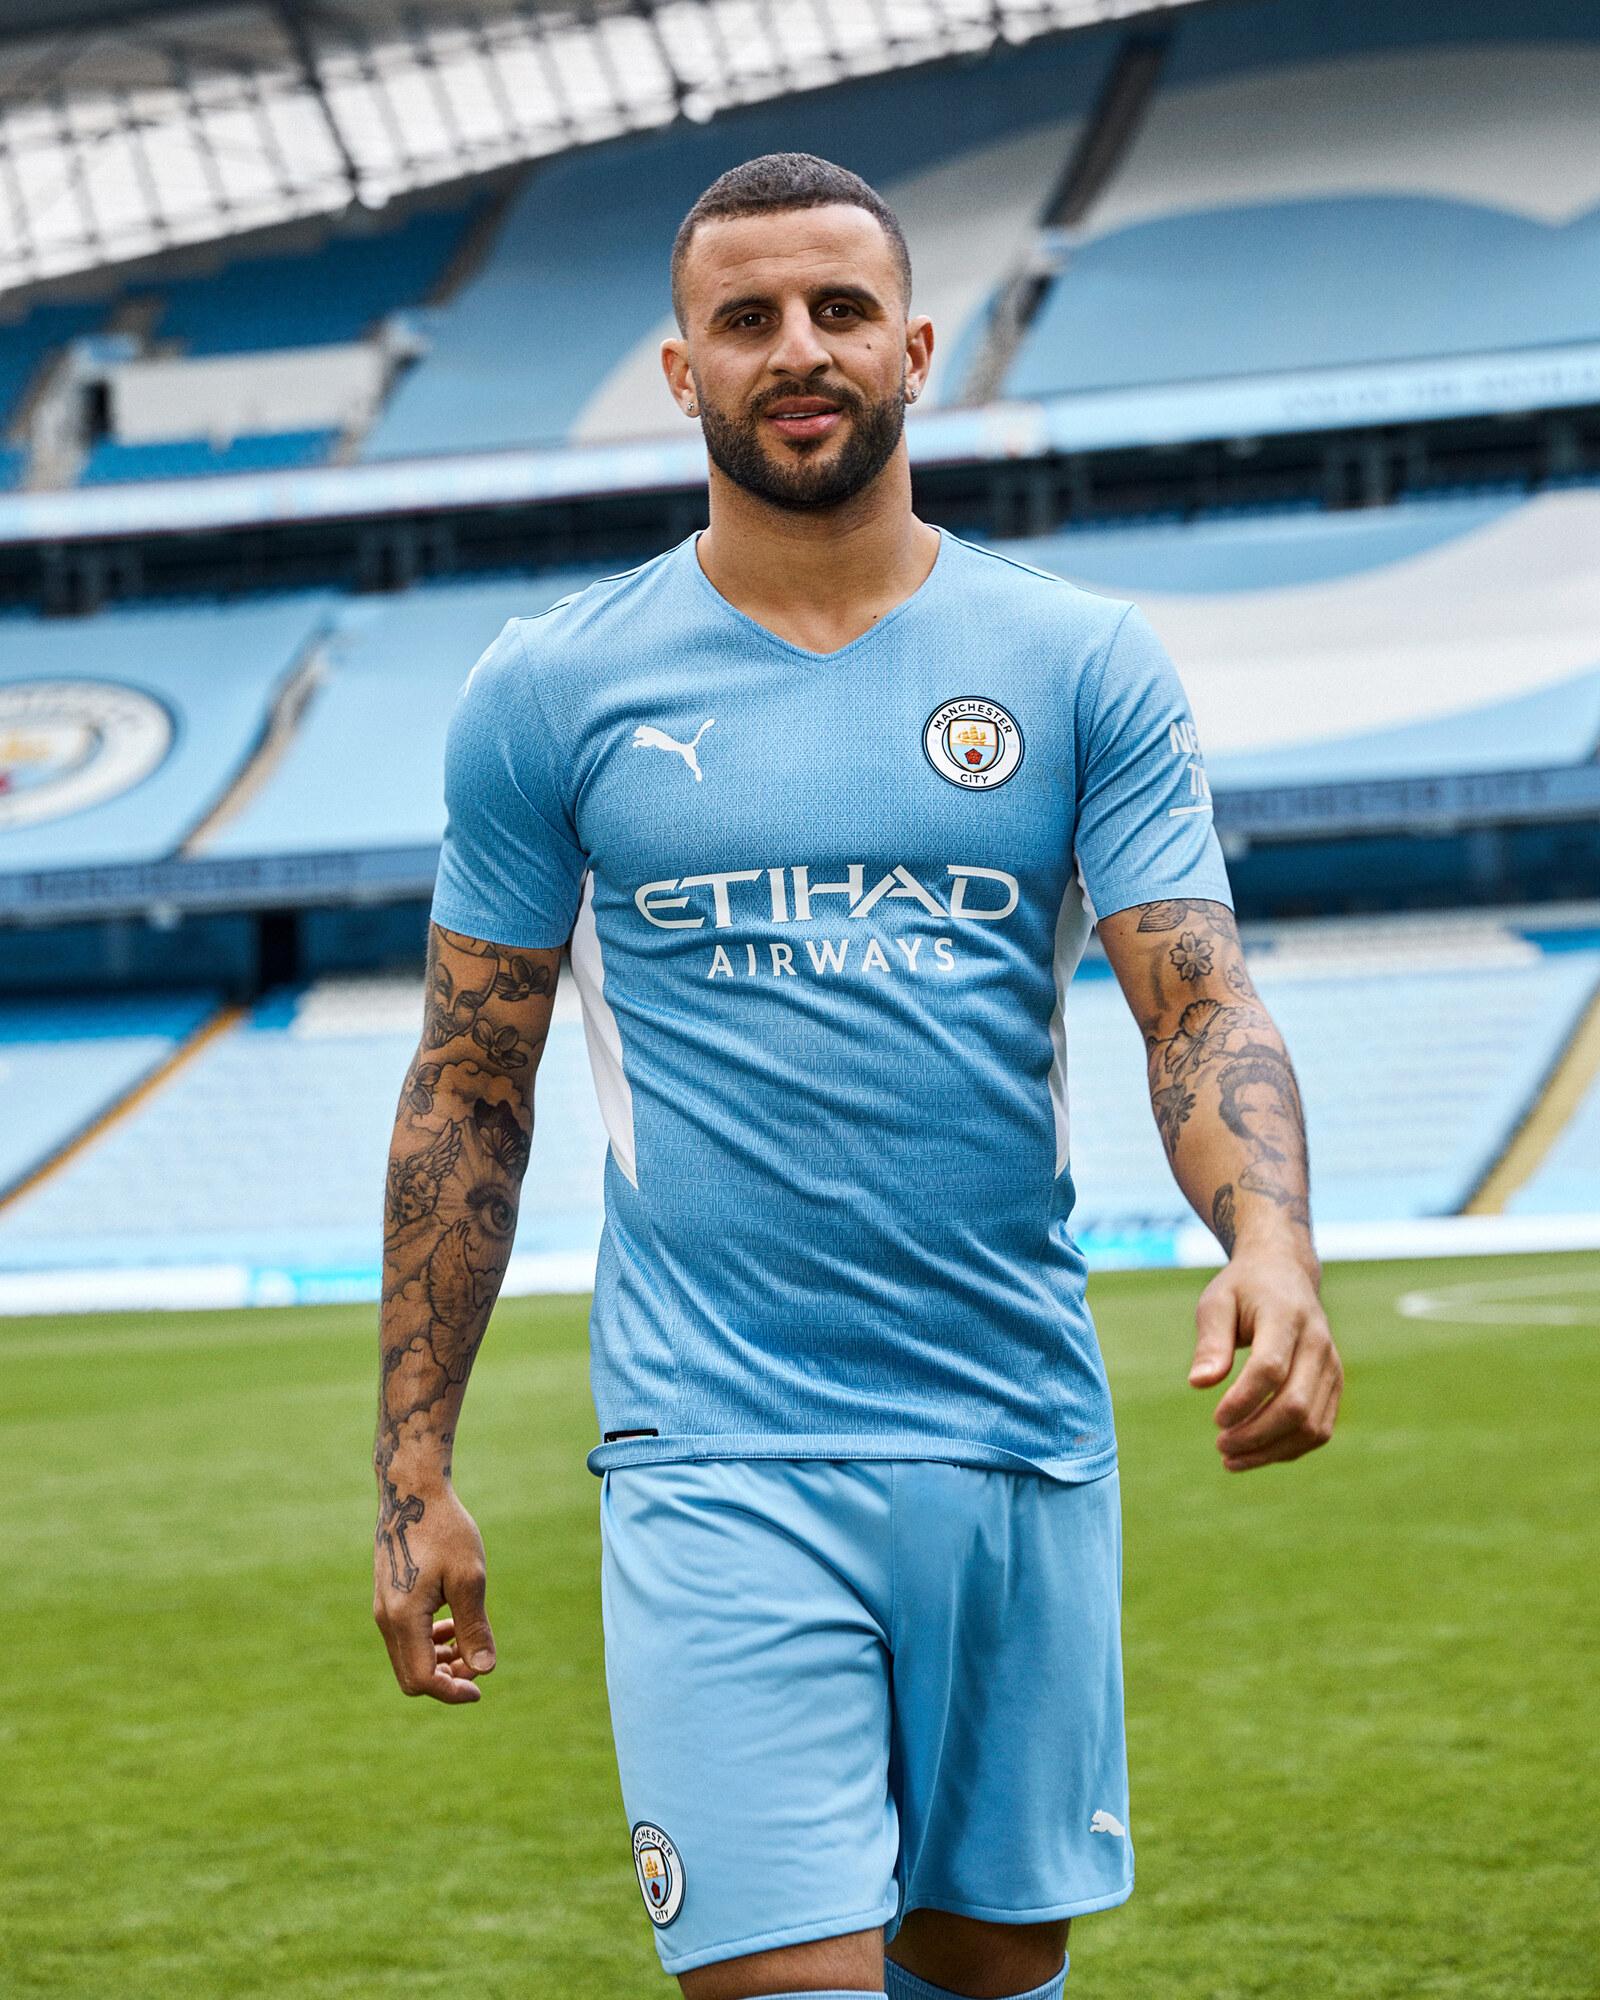 Manchester City Home Kit 2021-22